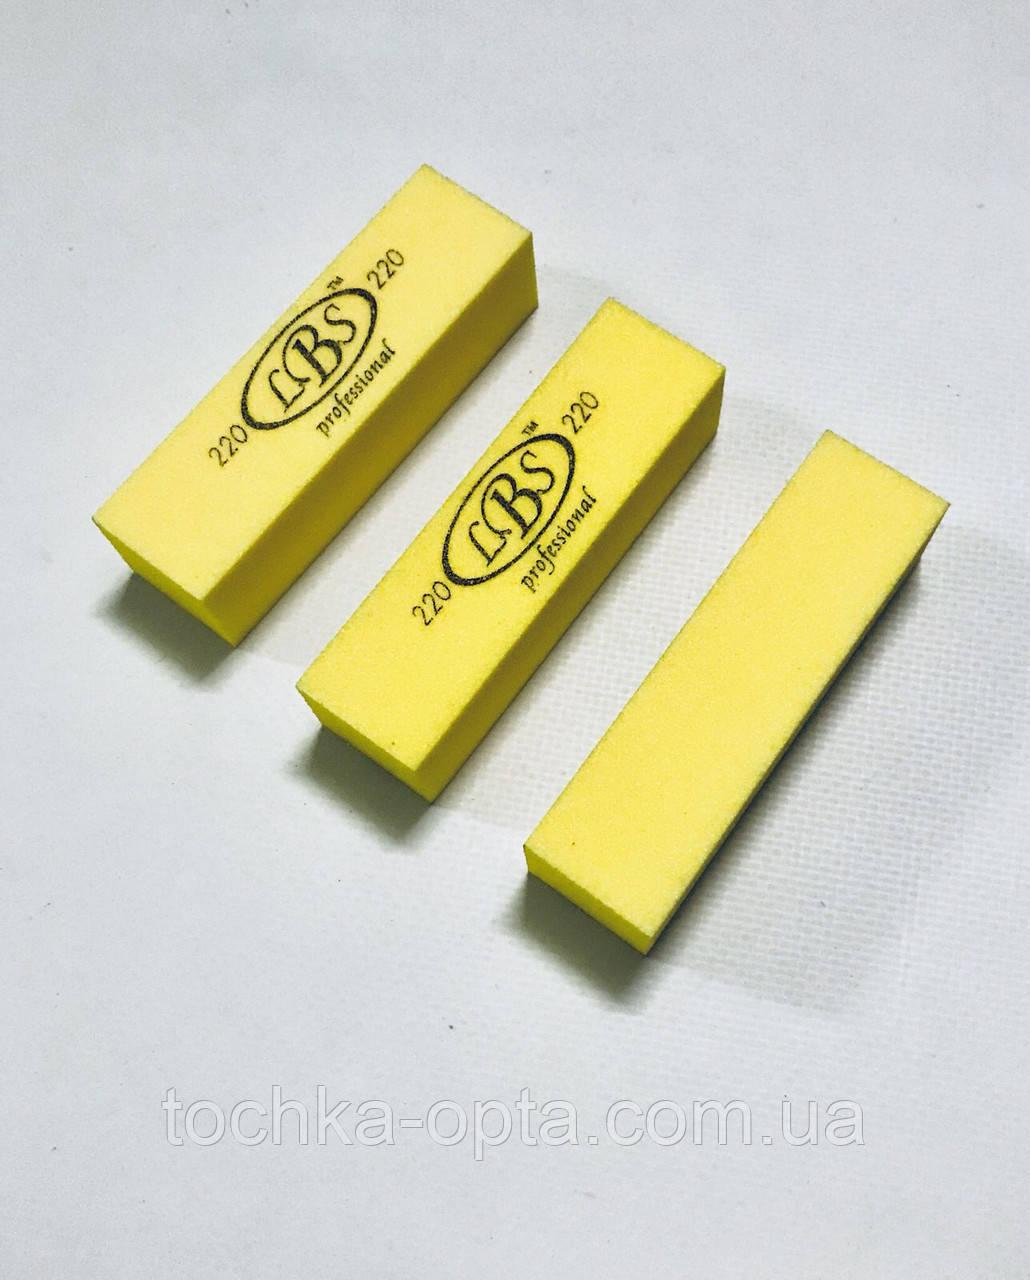 Бафы для ногтей LBS 220 гритт